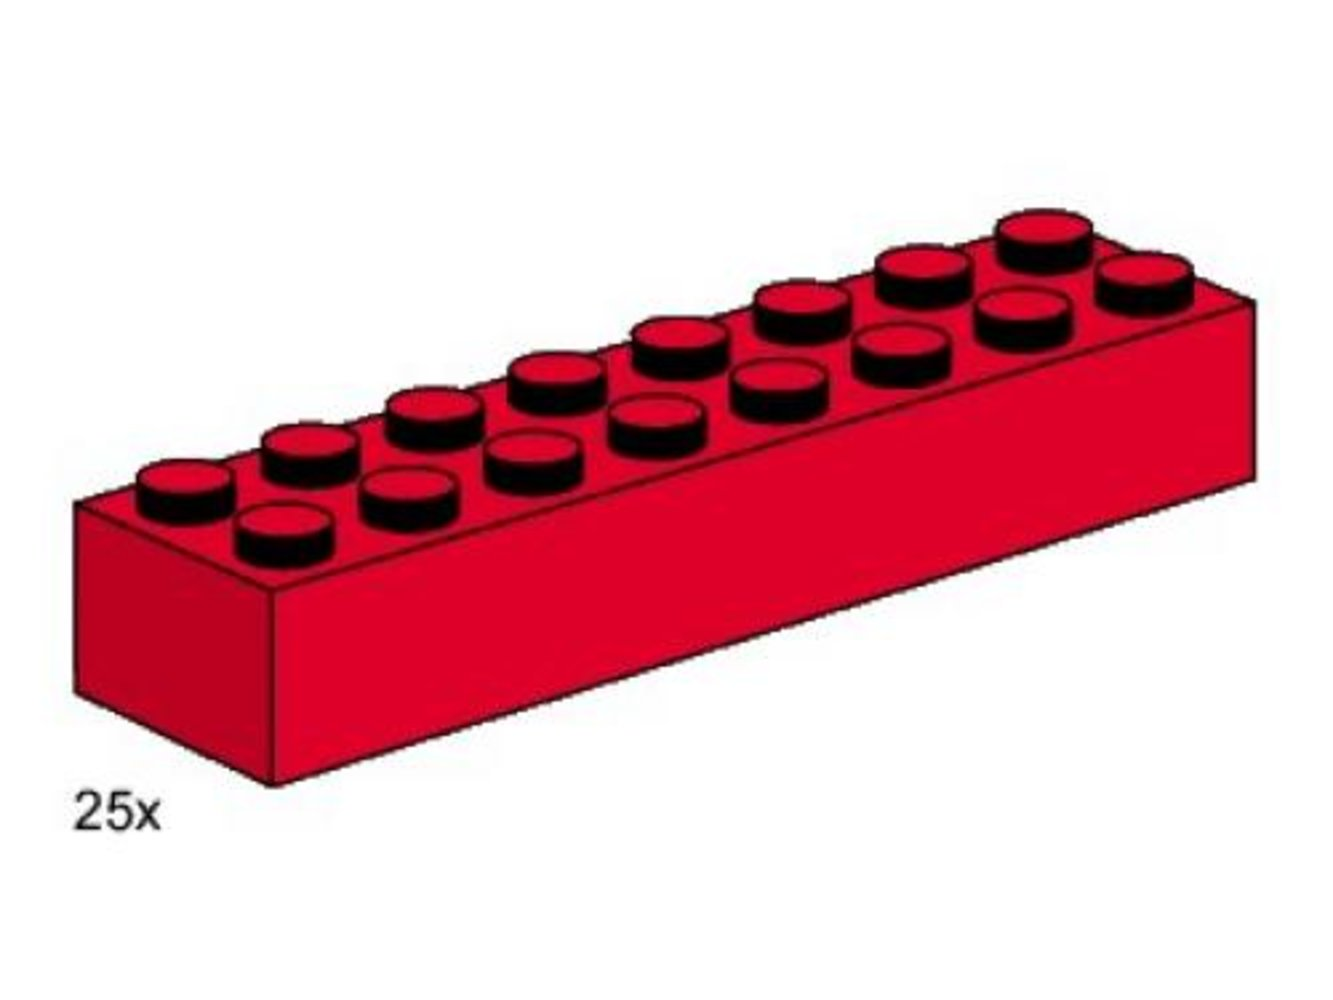 2 x 8 Red Bricks